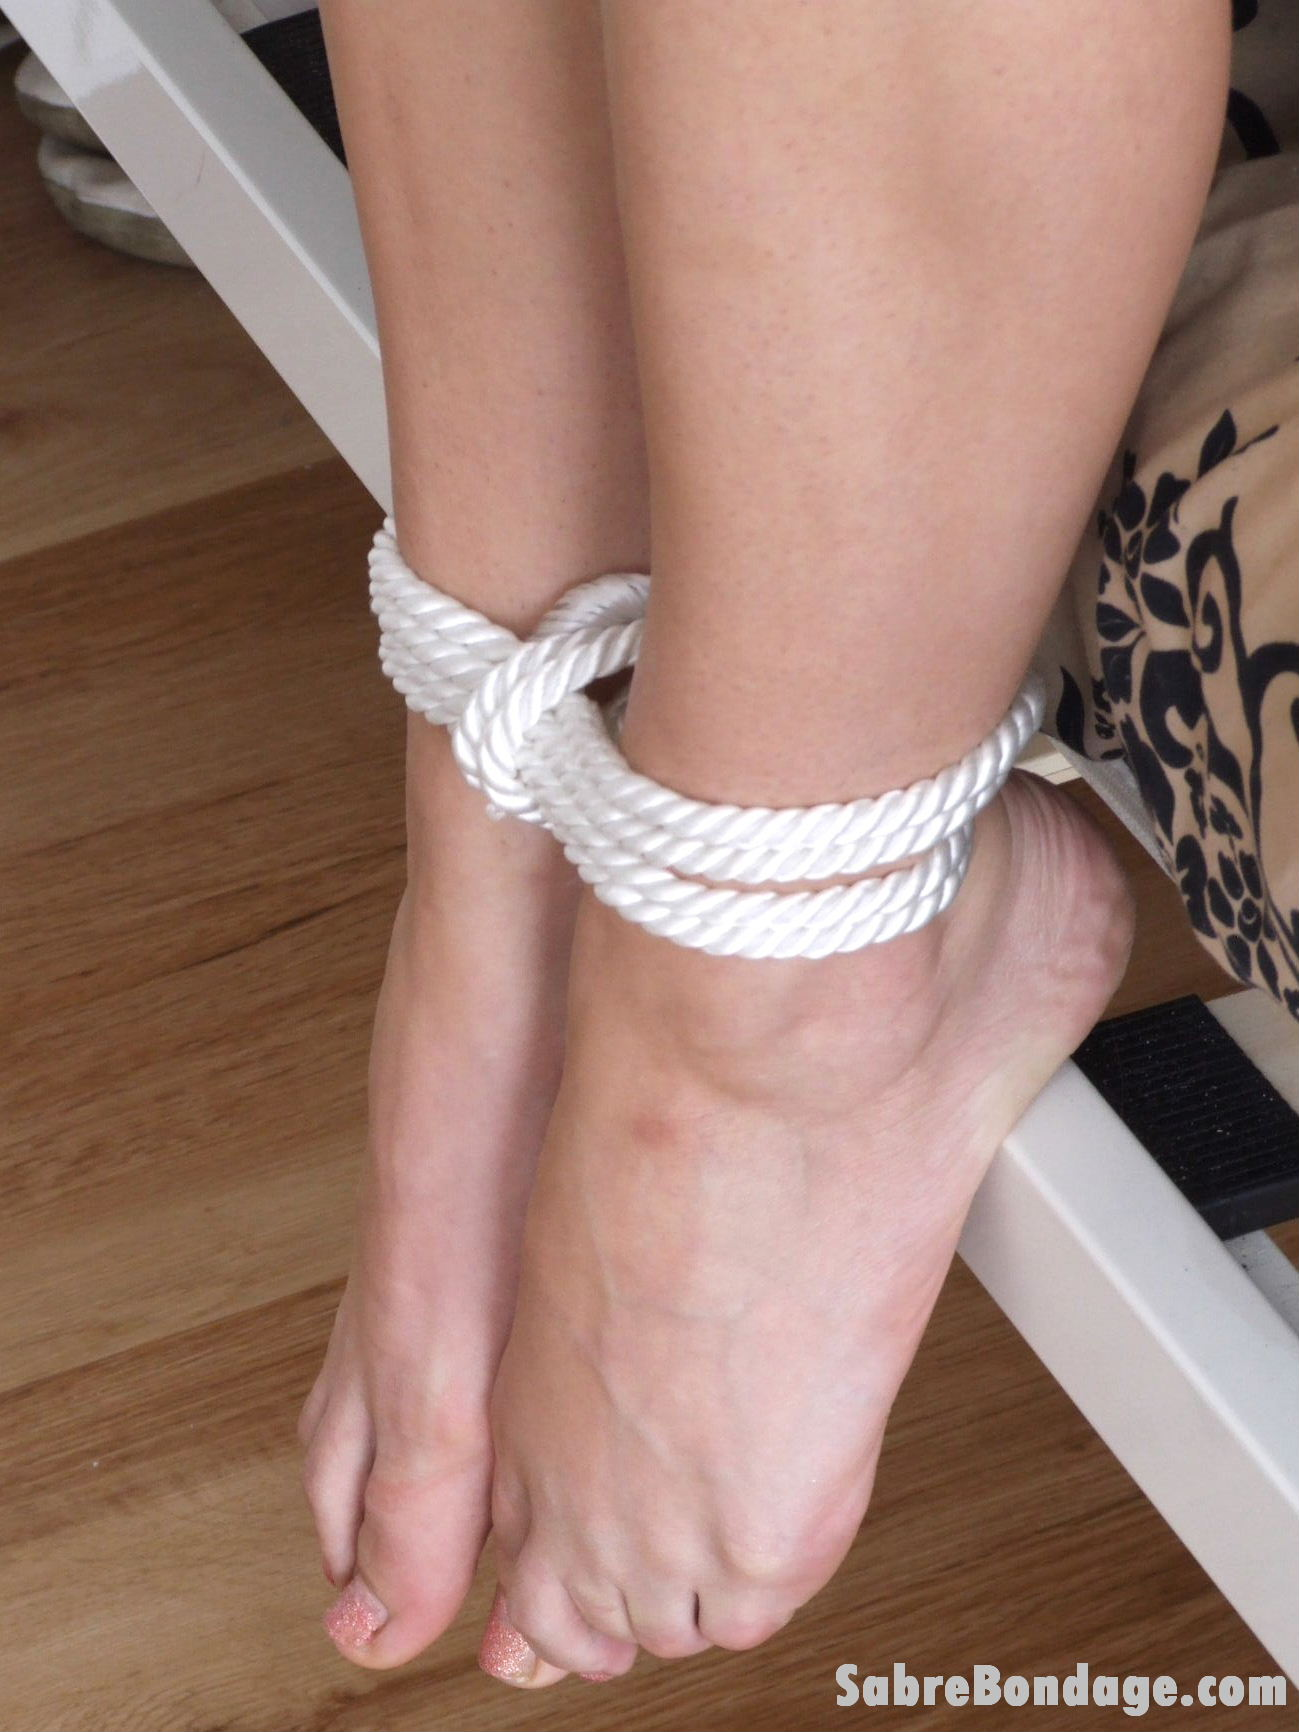 More Bound Feet